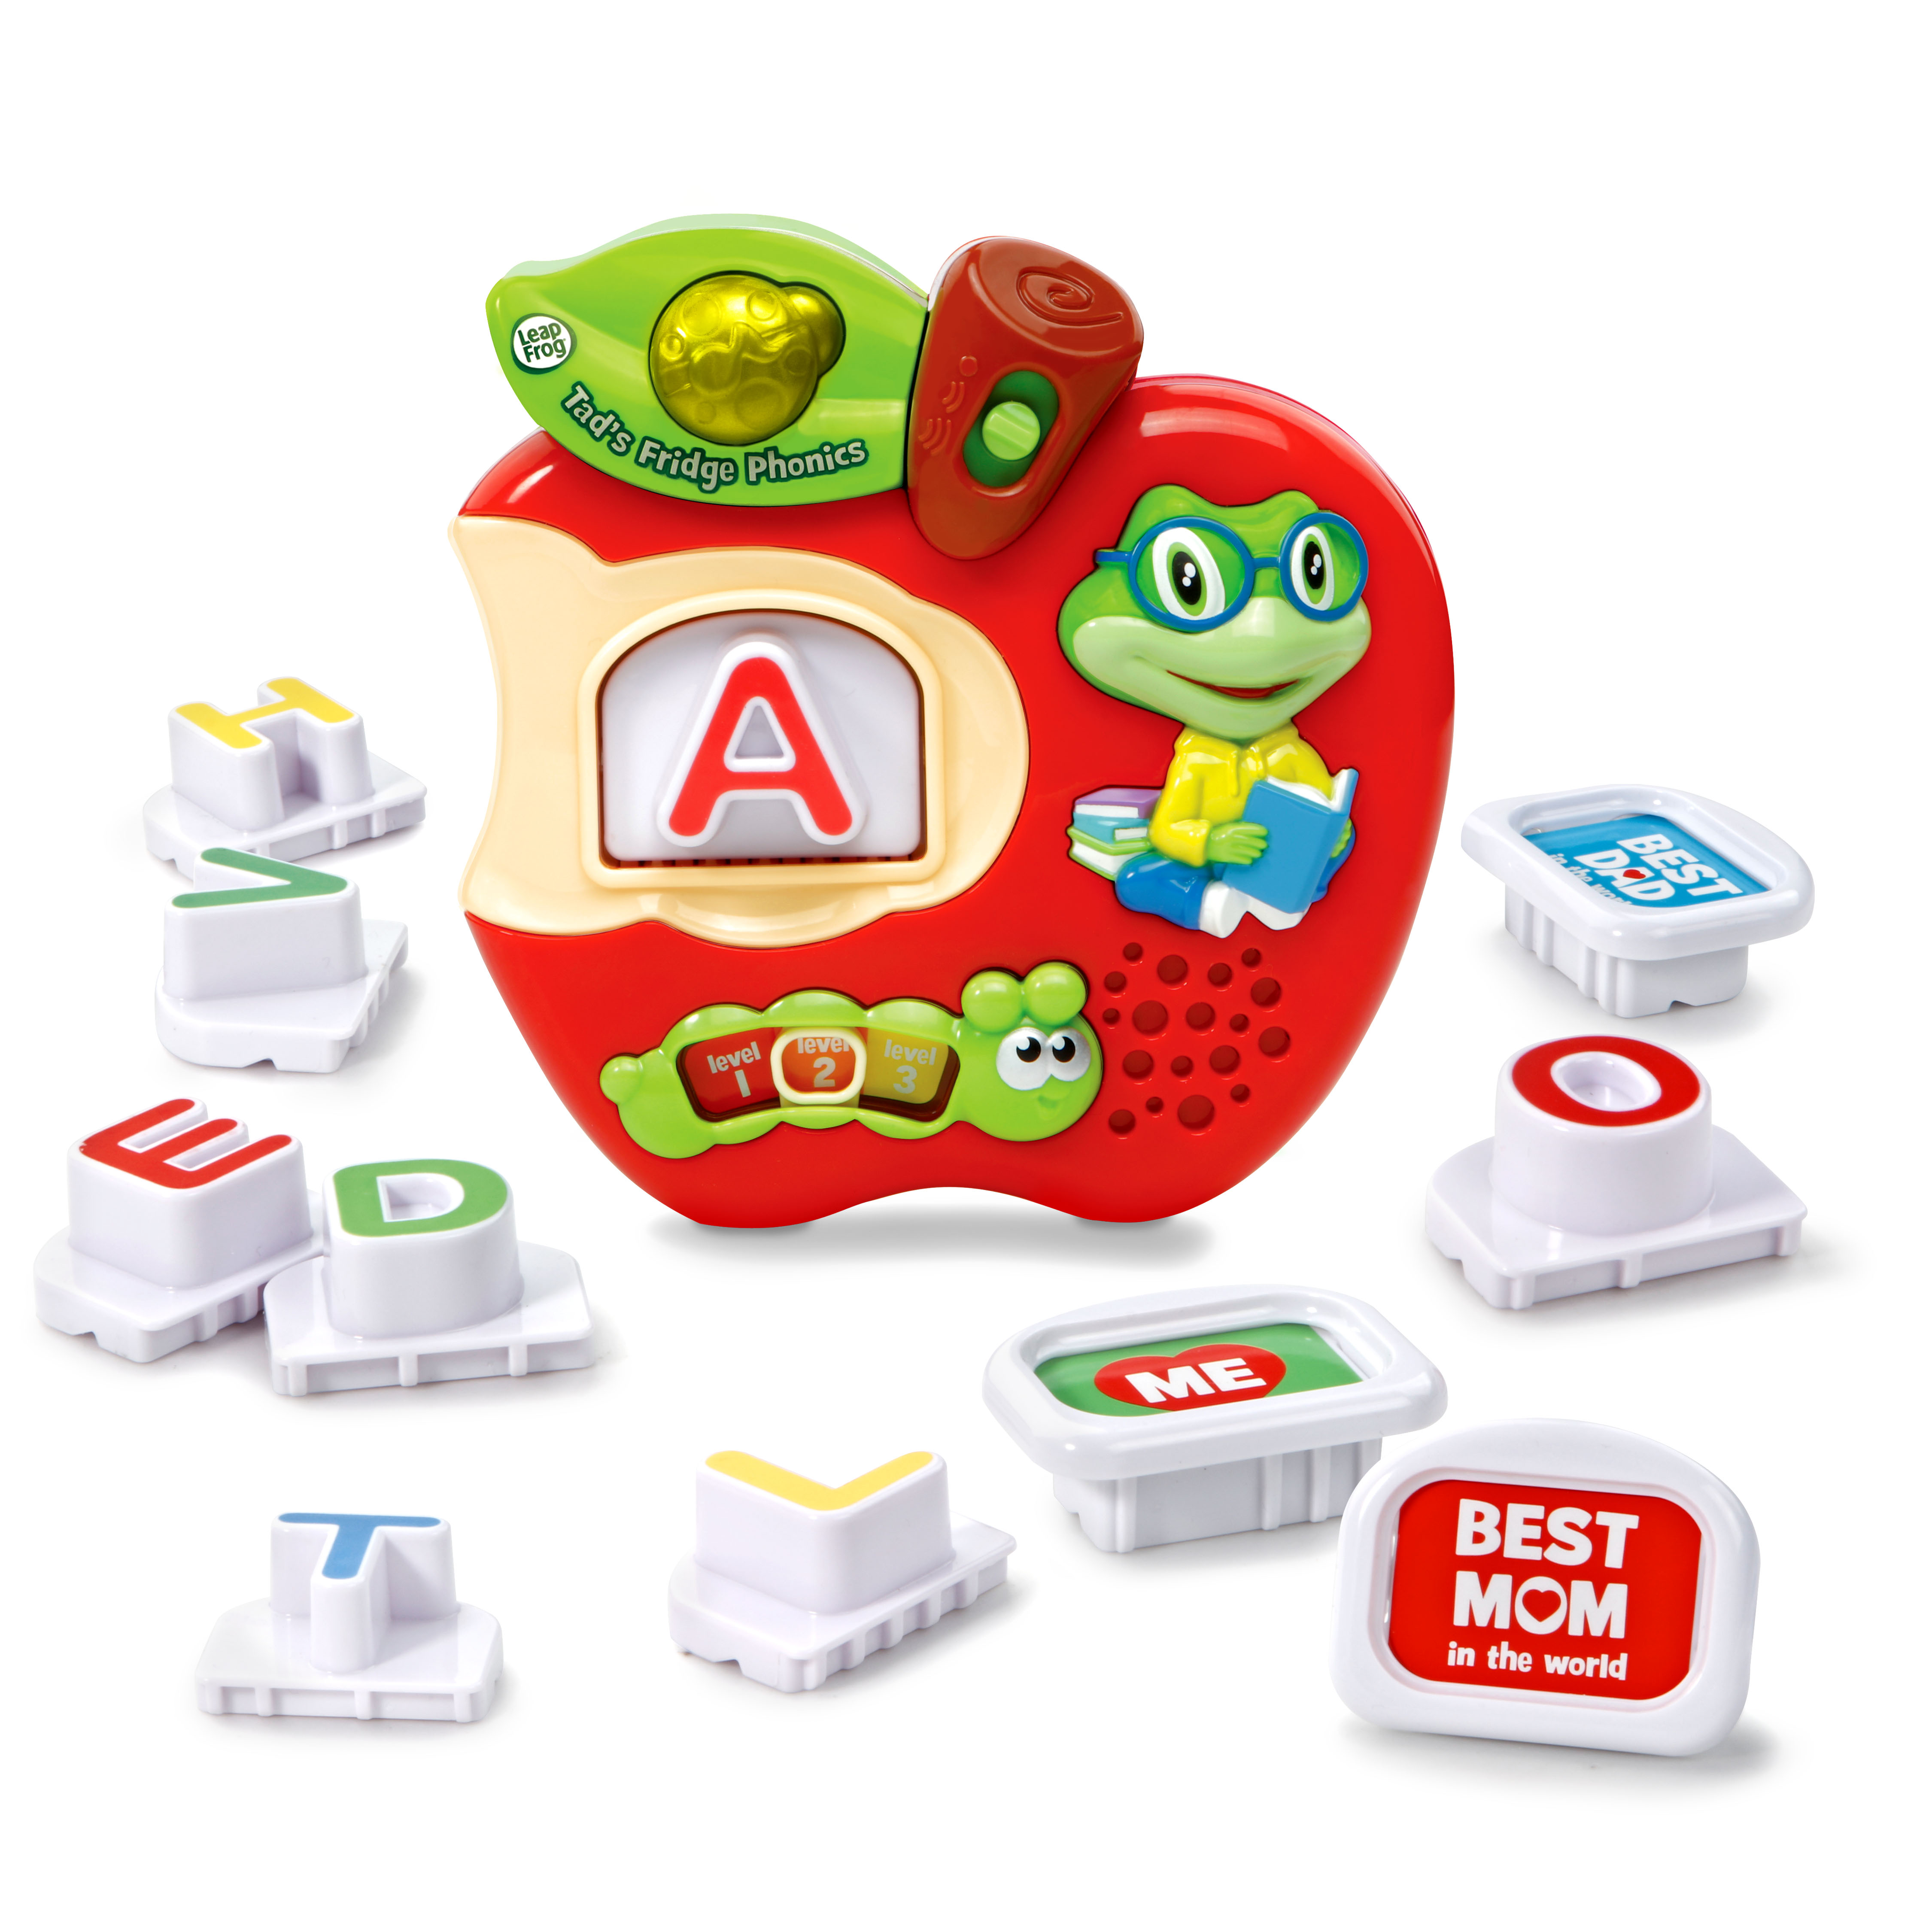 Teach Sing Talk Leap Frog Fridge Phonics 26 Magnetic Letter Set Alphabet Word